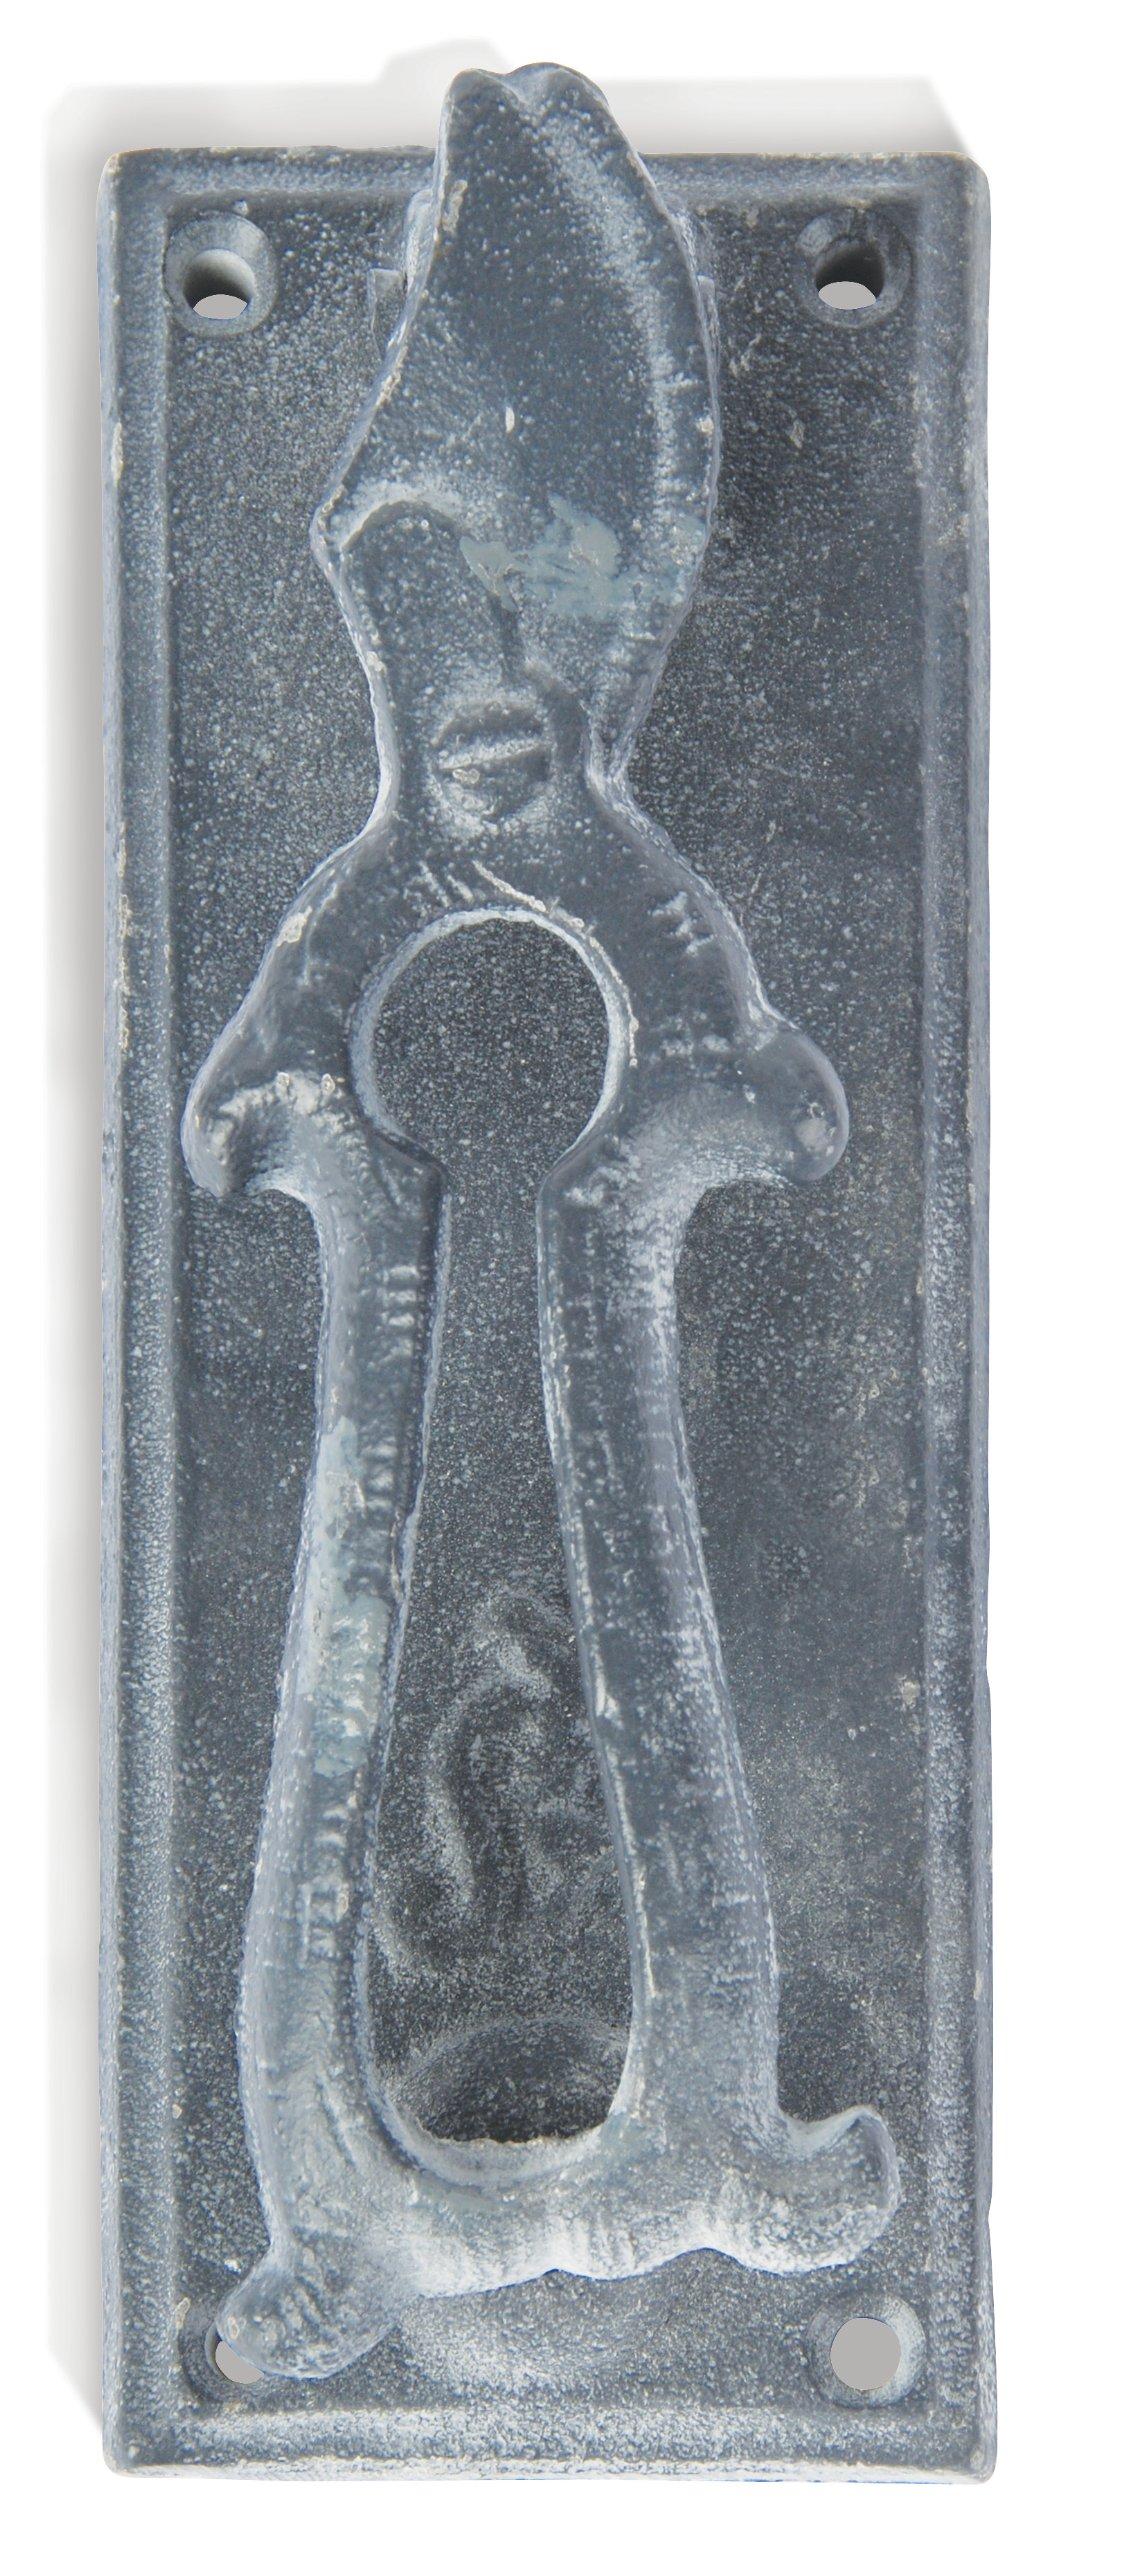 Esschert Design USA 8371 Secrets du Potager Pruning Scissors Door Knocker, Grey Finish